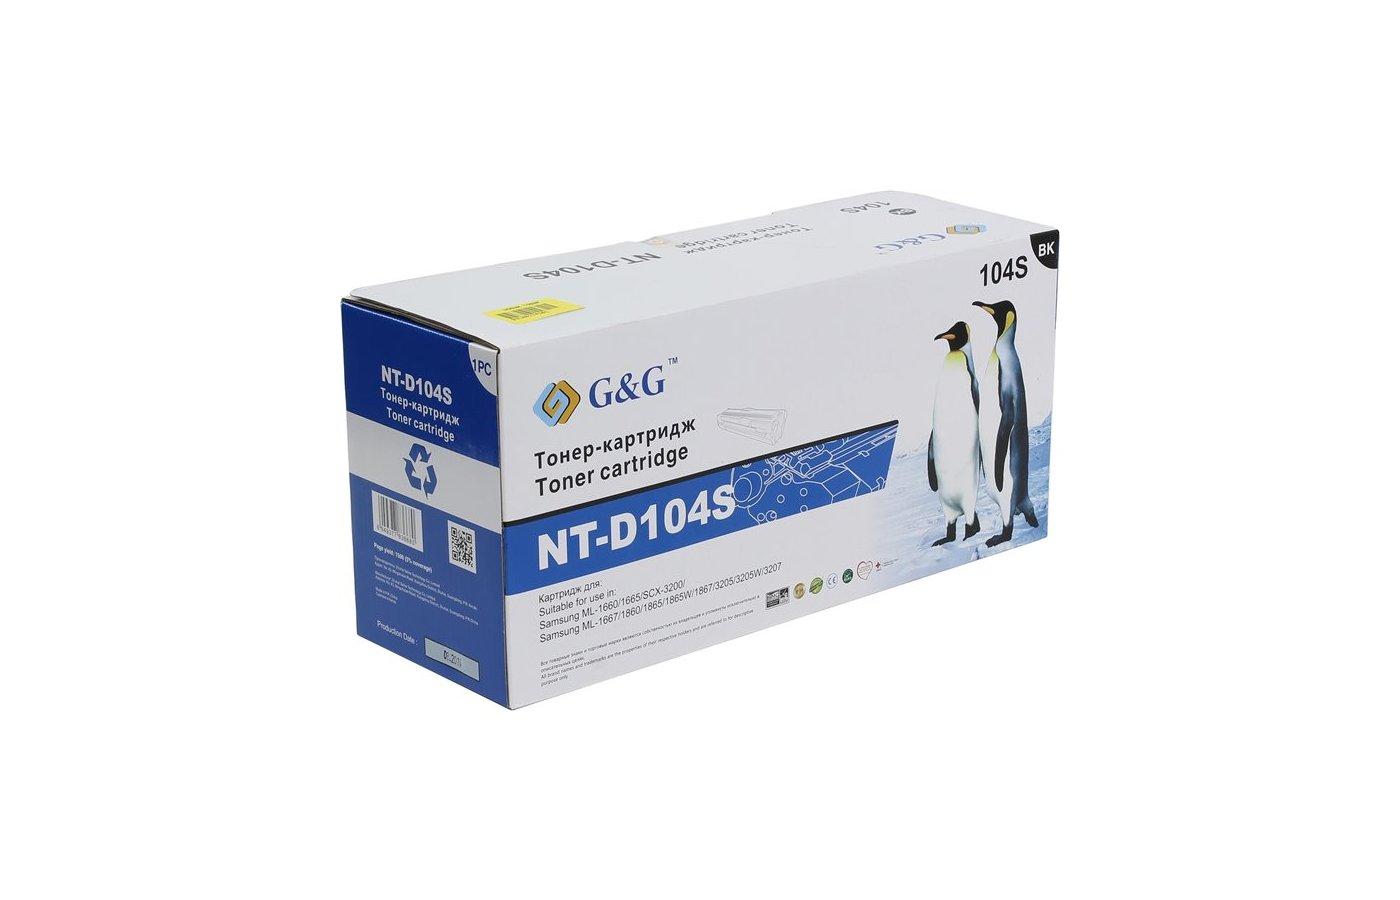 Картридж лазерный GG NT-D104S Совместимый для Samsung ML-1660/1661/1665 SCX-3200/3205/3207/3210/3217 (1500стр)